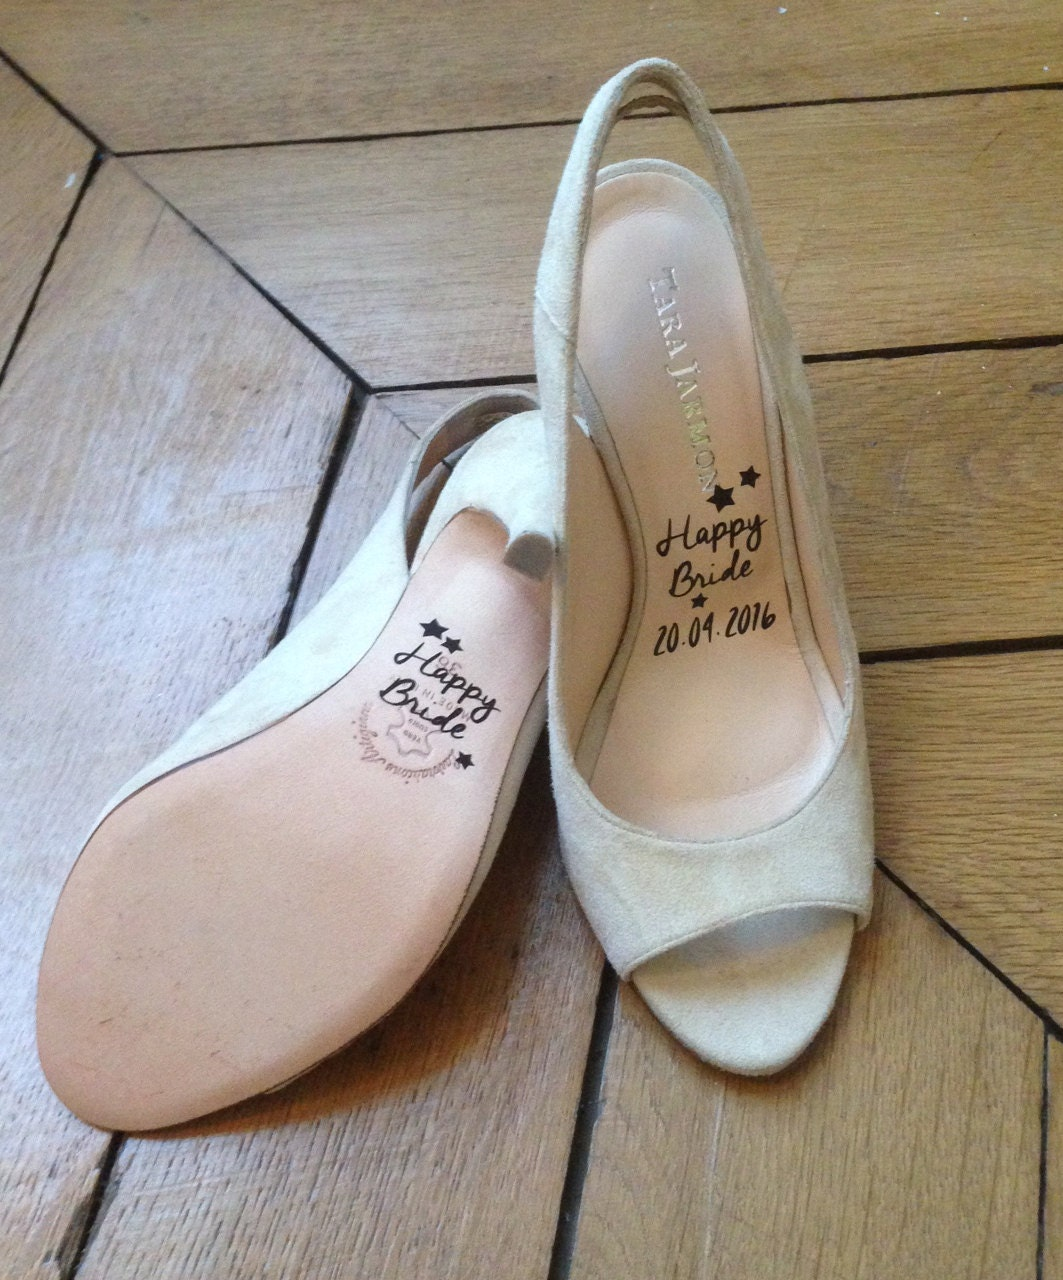 Stickers Wedding Shoes: HAPPY BRIDE For Footwear